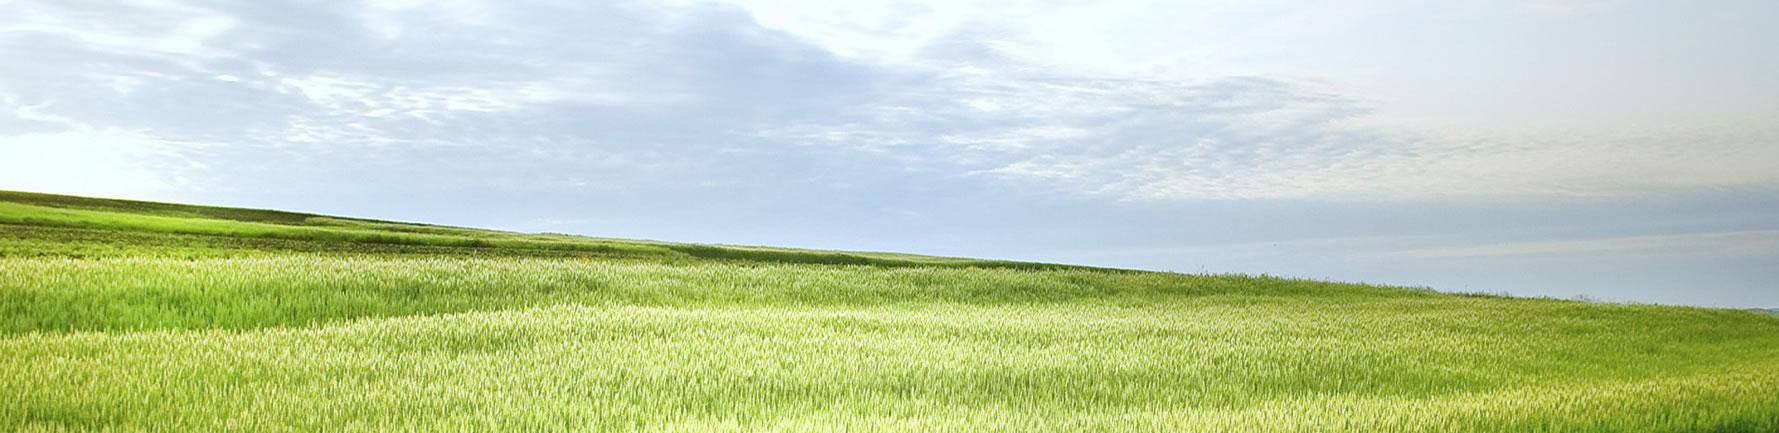 slider-grass